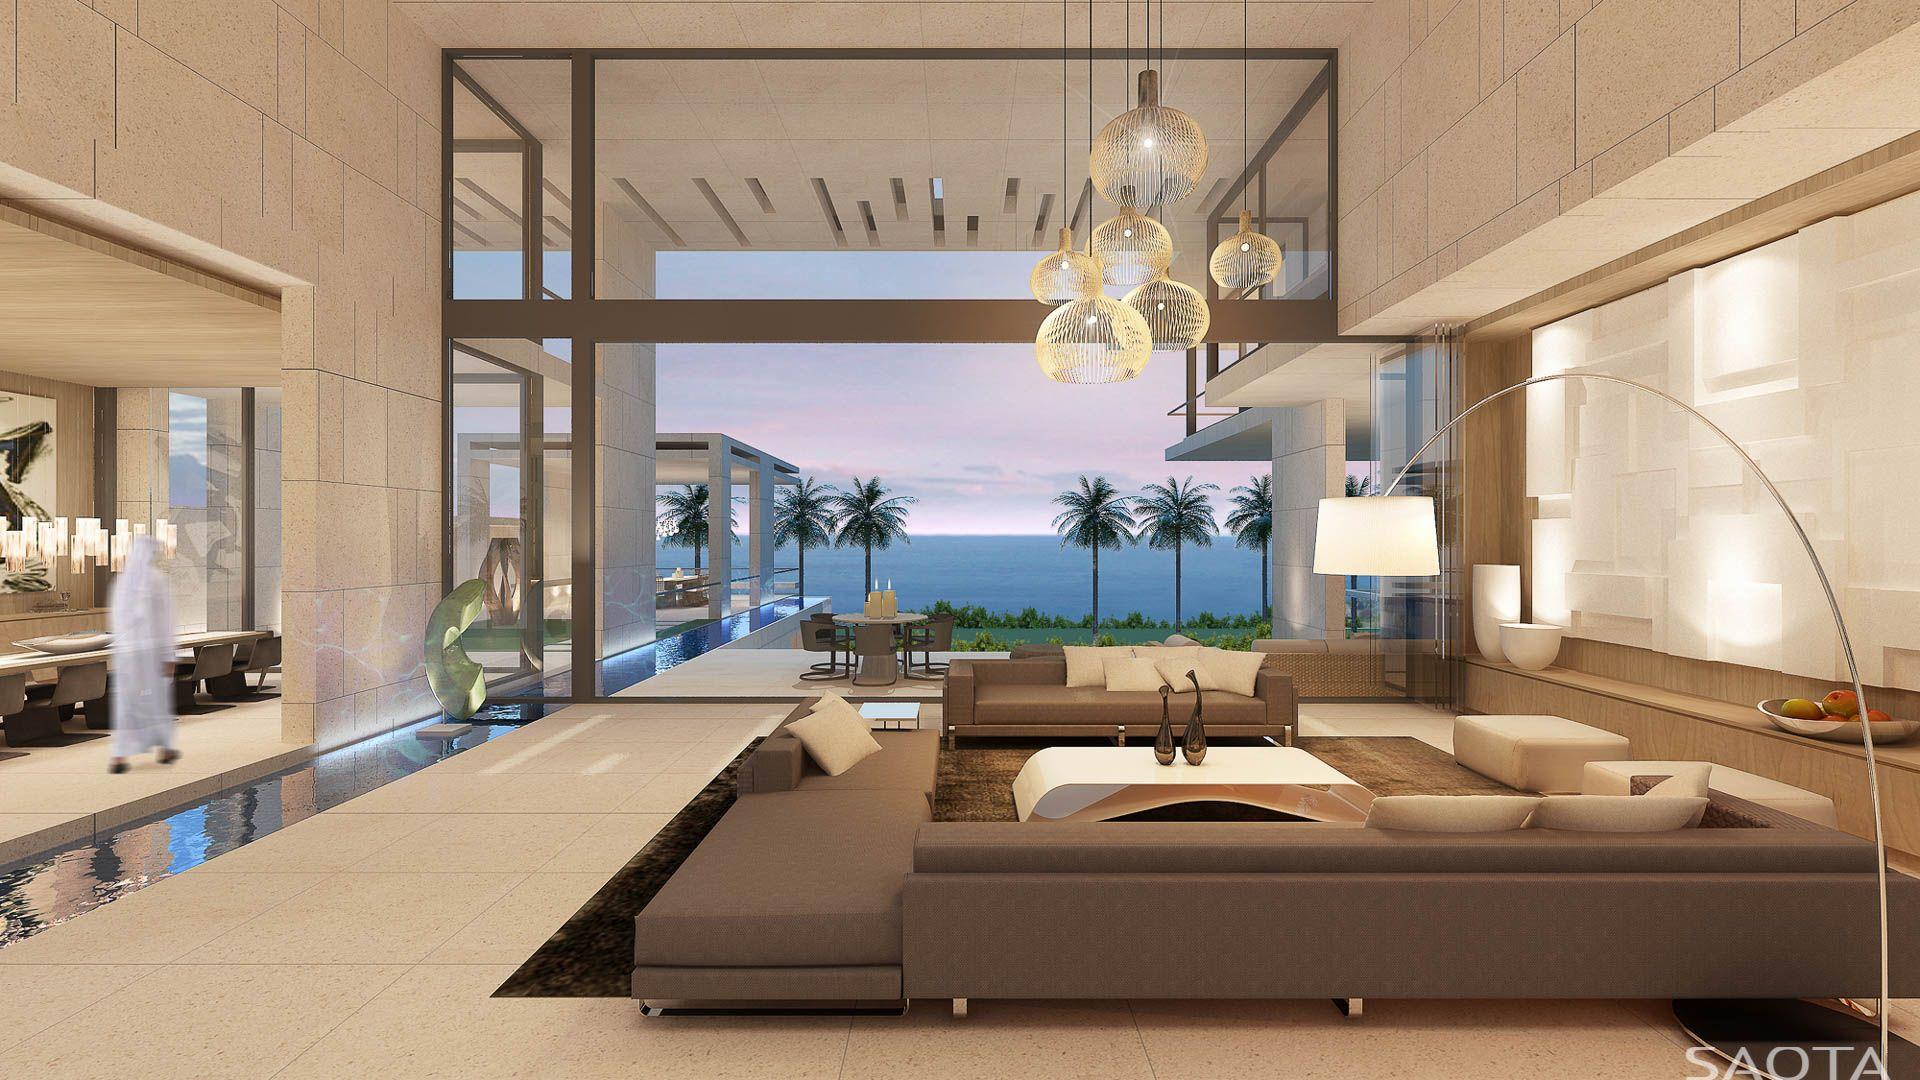 Modern dream house interior design ideas with beautiful pendant modern dream house interior design ideas with beautiful pendant lights mozeypictures Gallery